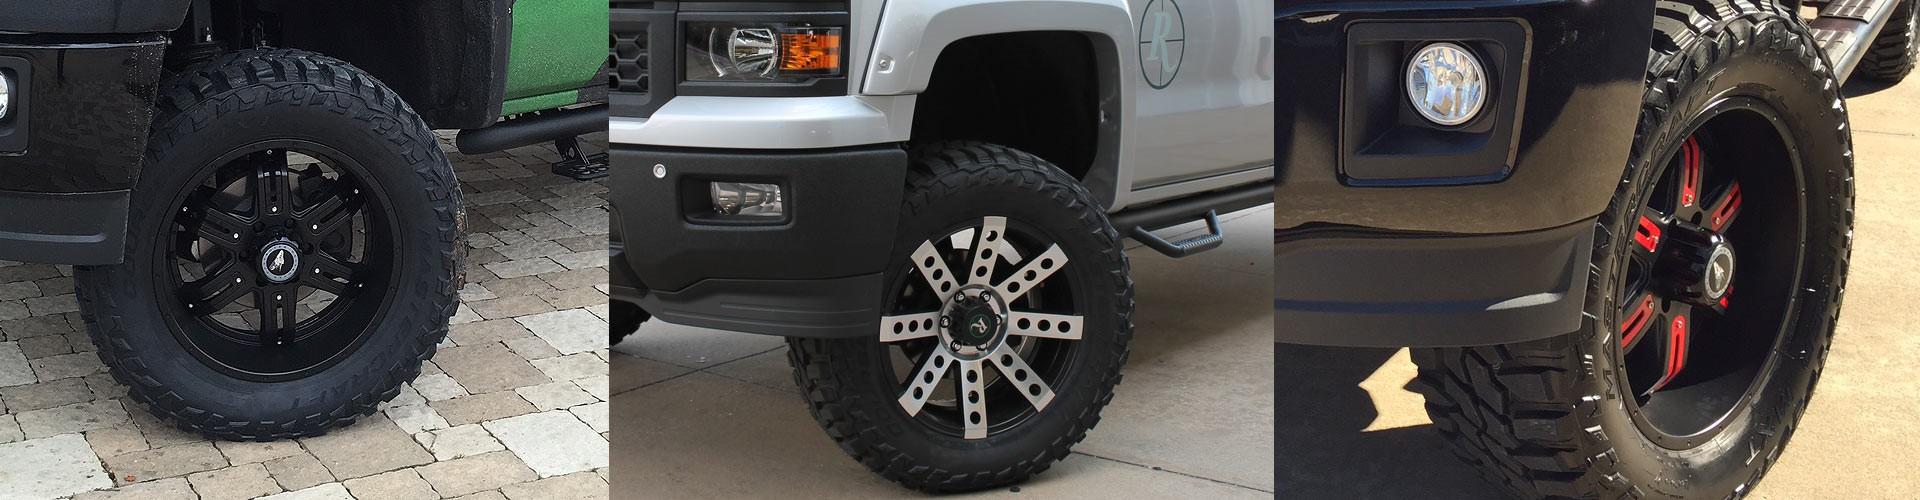 Dallas Forth Worth JEEP, Truck, SUV, Auto Wheels   Tires   Rims   JRu0027s  Custom Auto Irving, TX